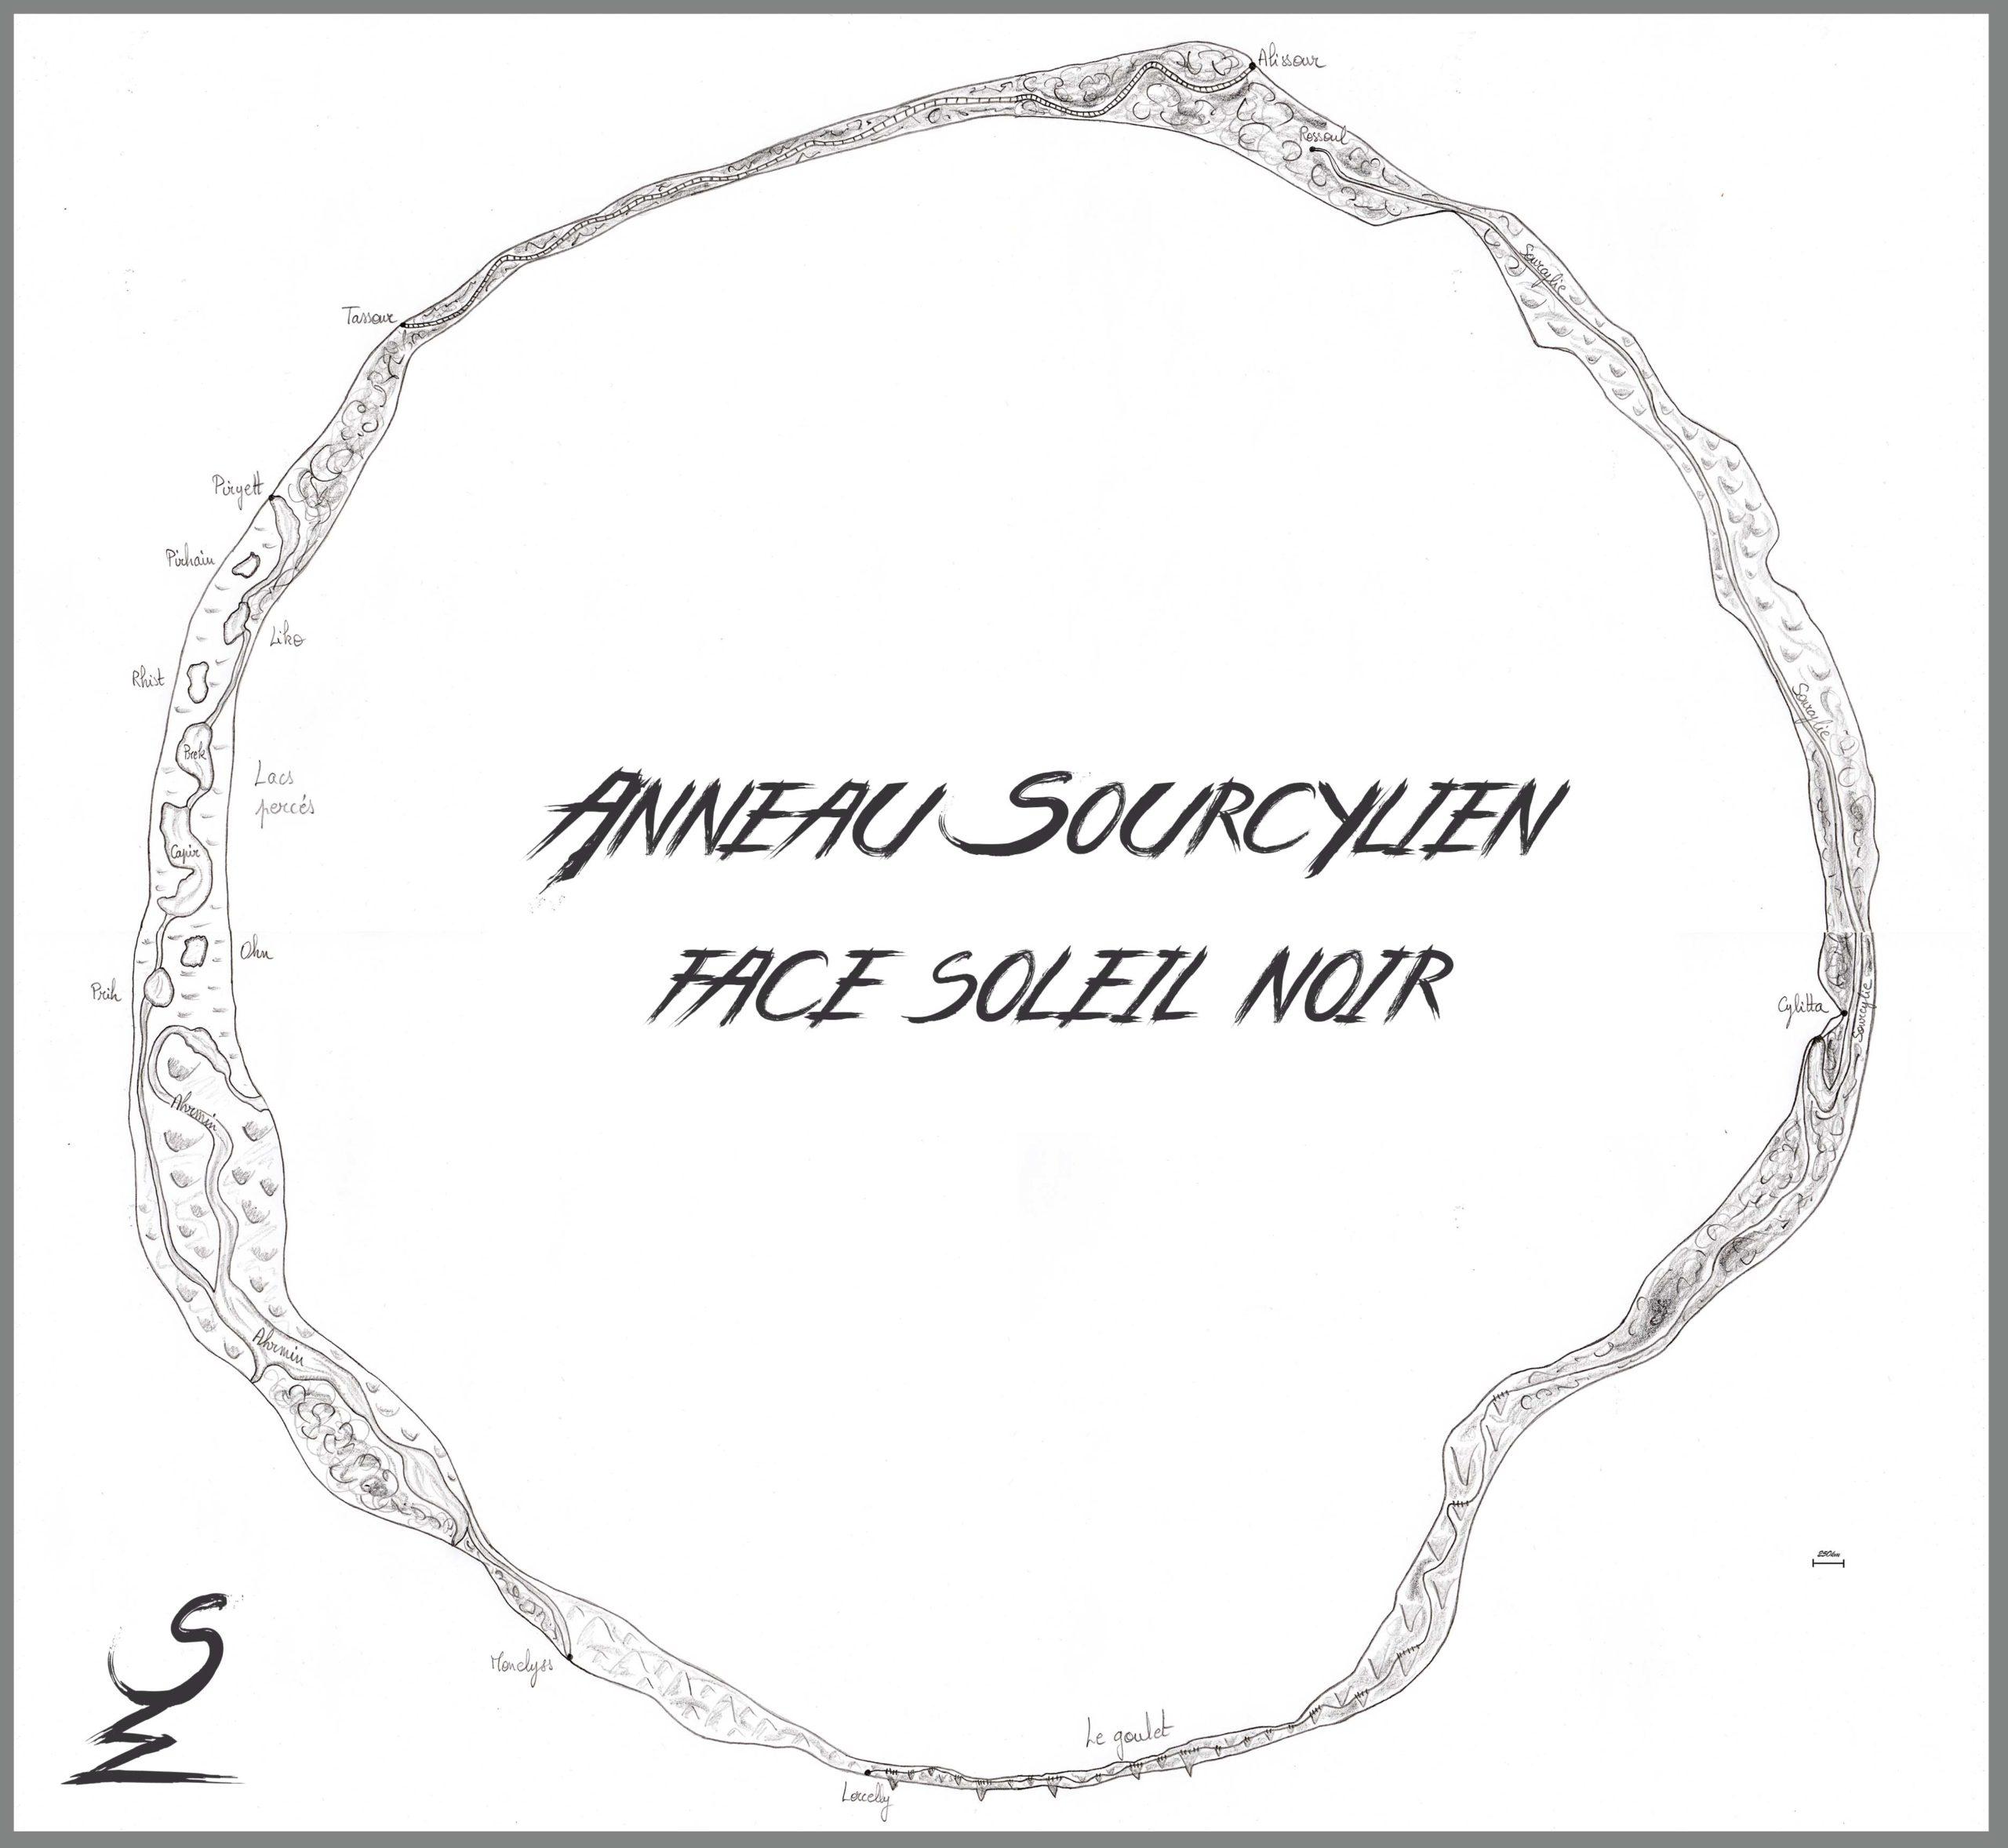 Plan anneau Sourcylien 2 copyright Sandrine WALBEYSS